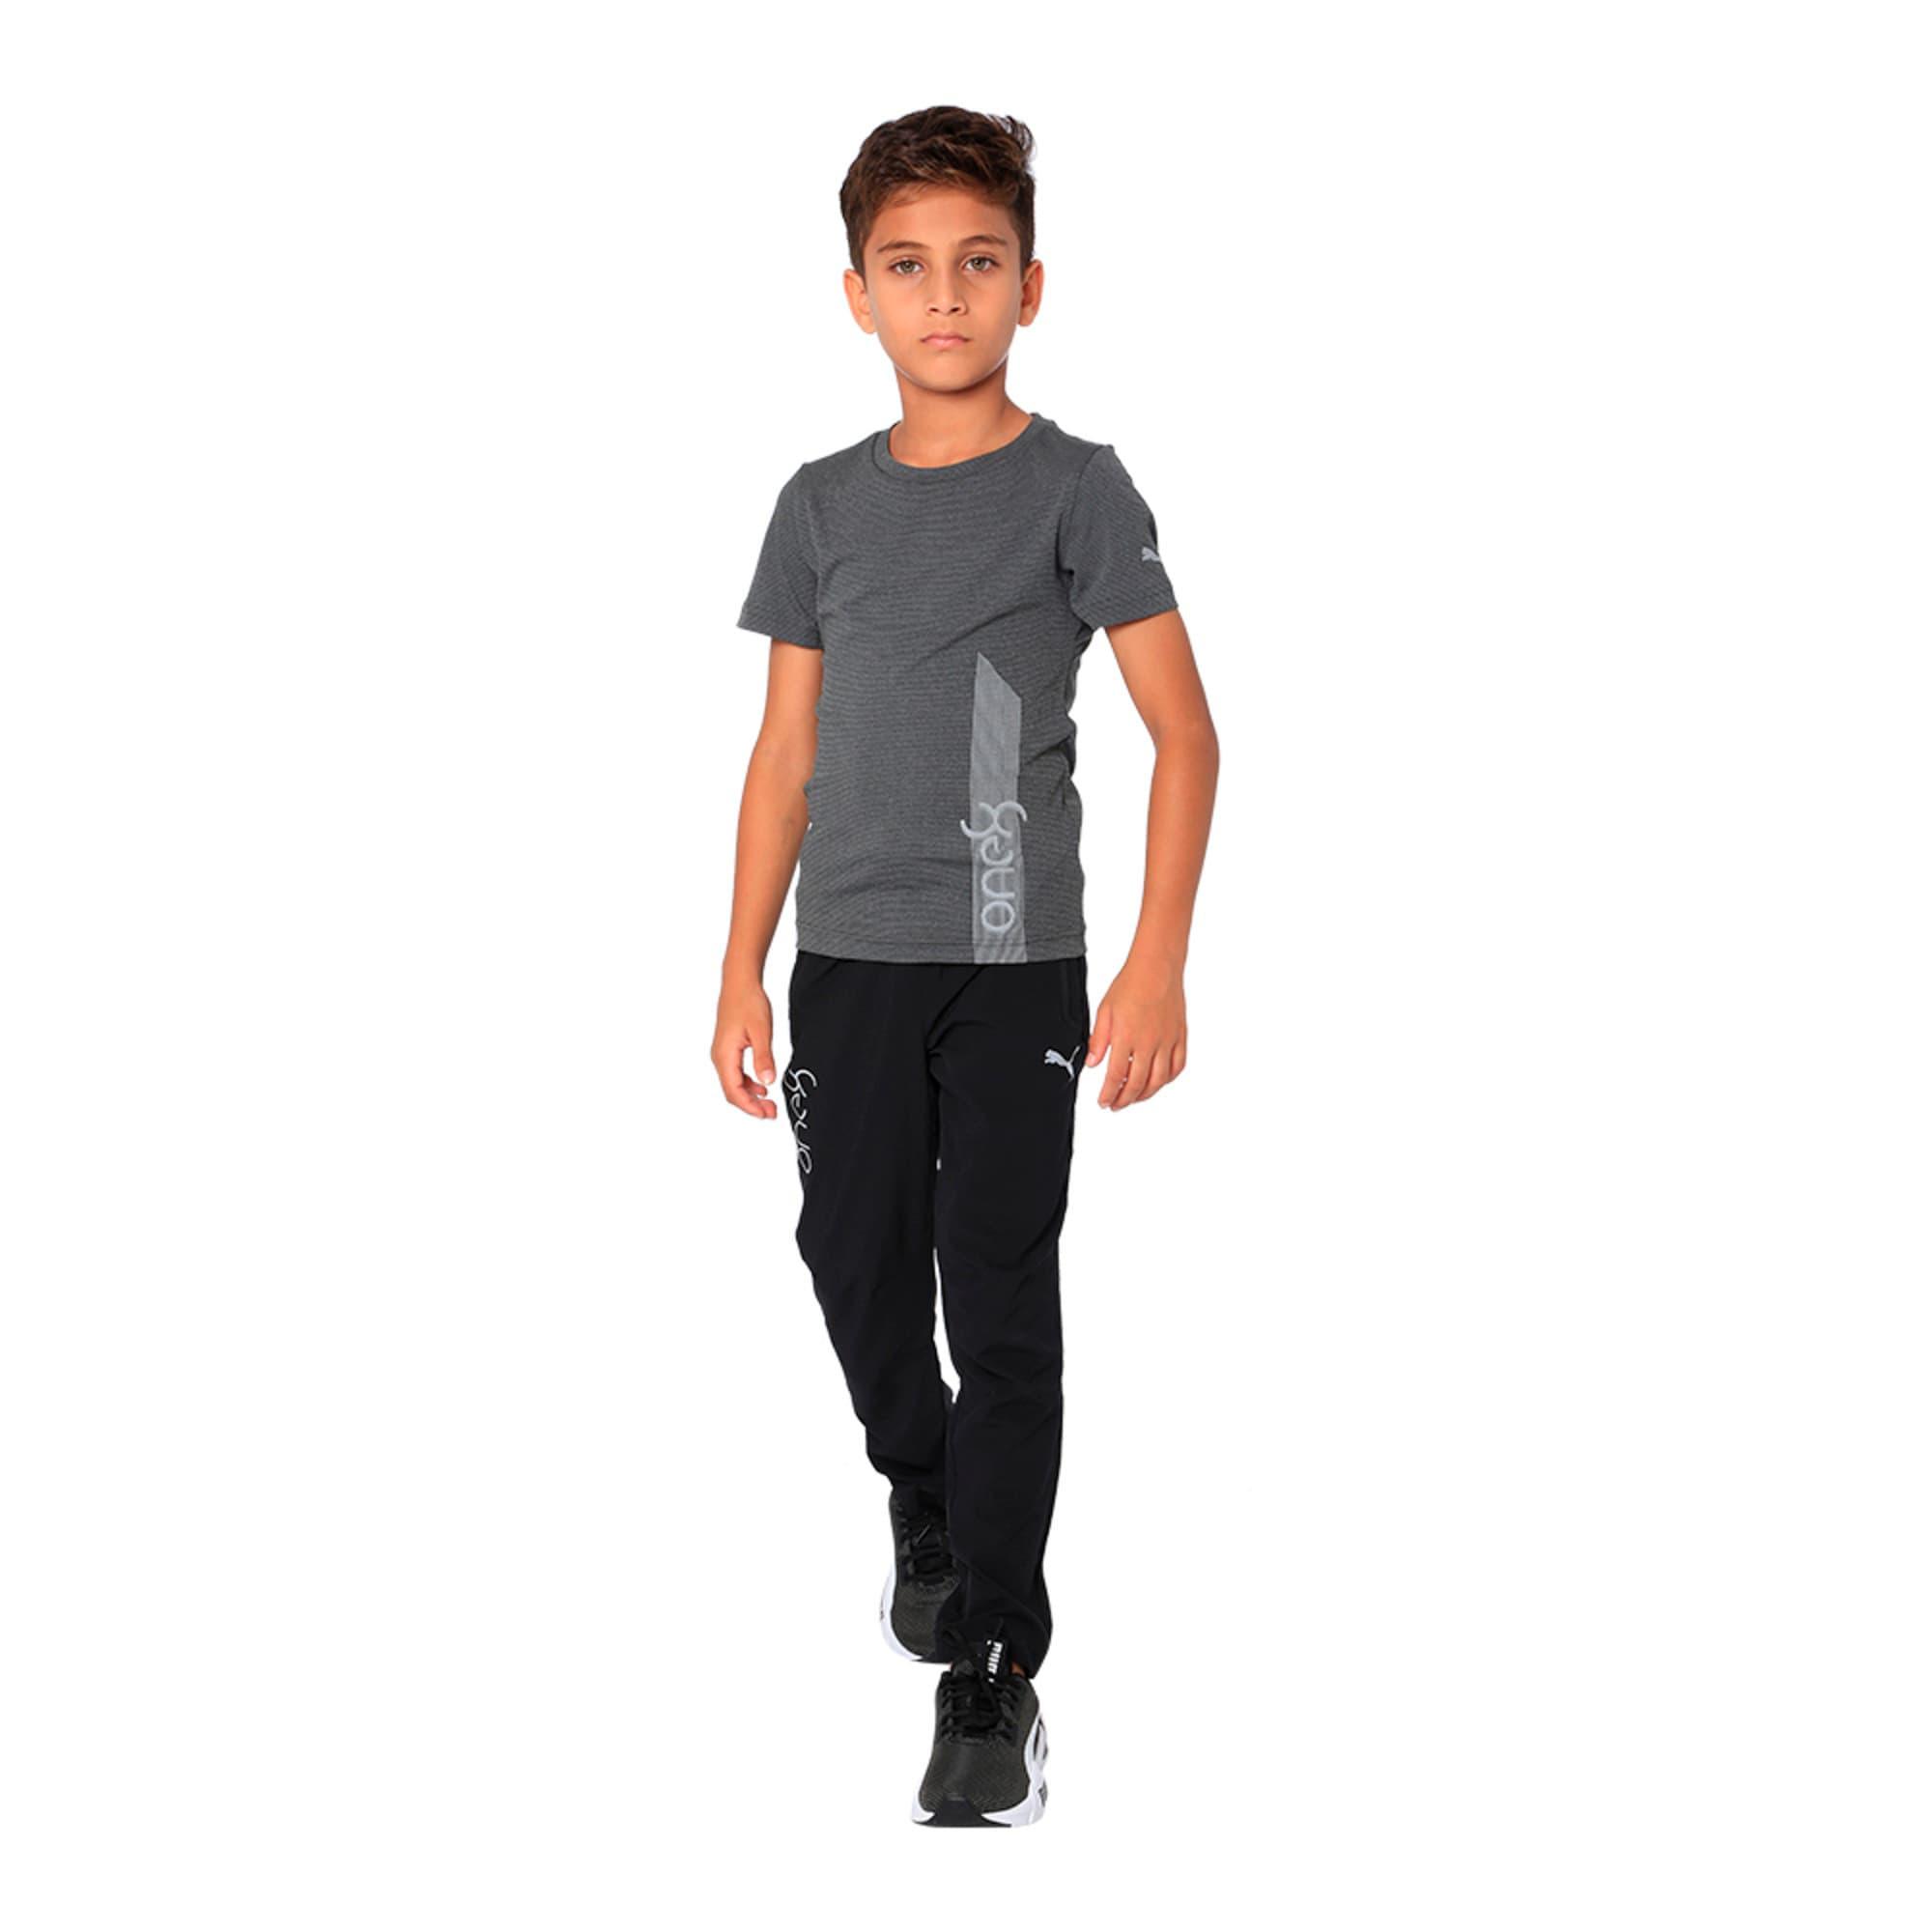 Thumbnail 3 of one8 VK Kids' Active Pants, Puma Black, medium-IND